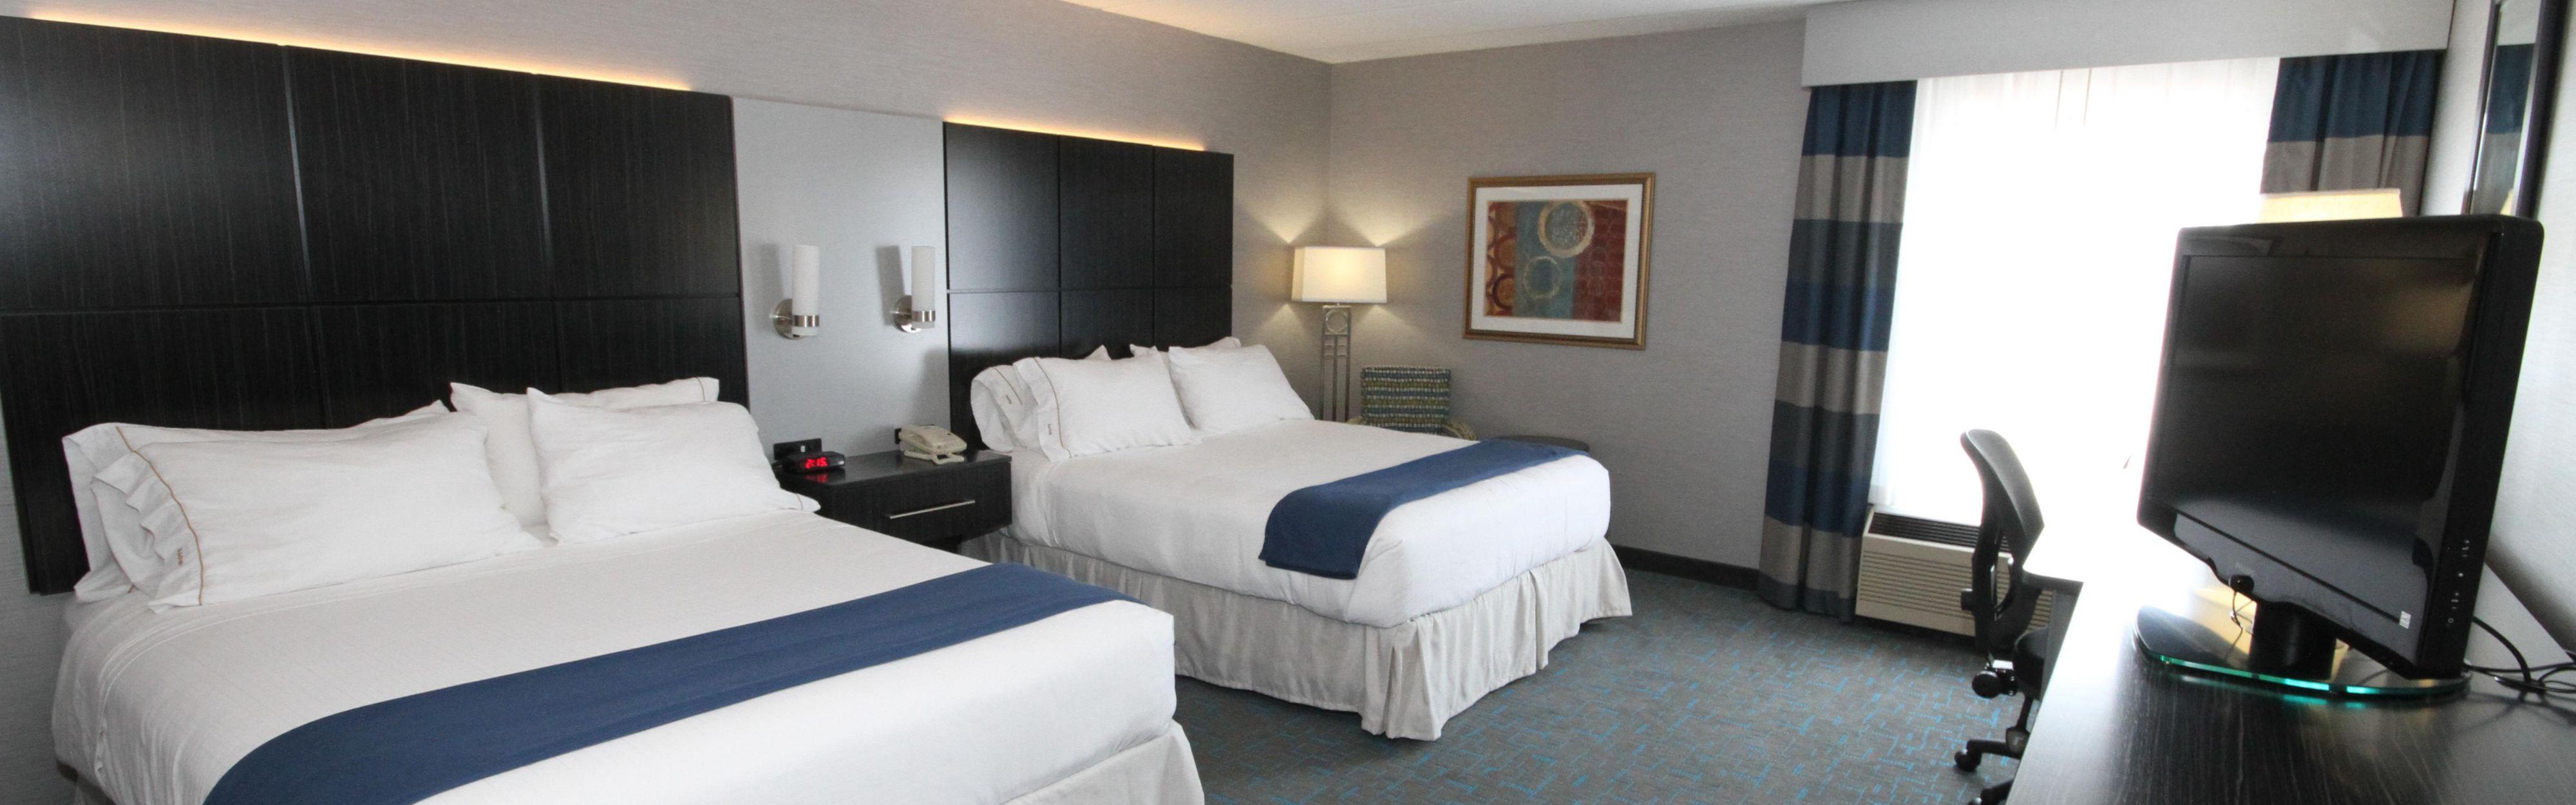 Holiday Inn Express Janesville-I-90 & Us Hwy 14 image 1